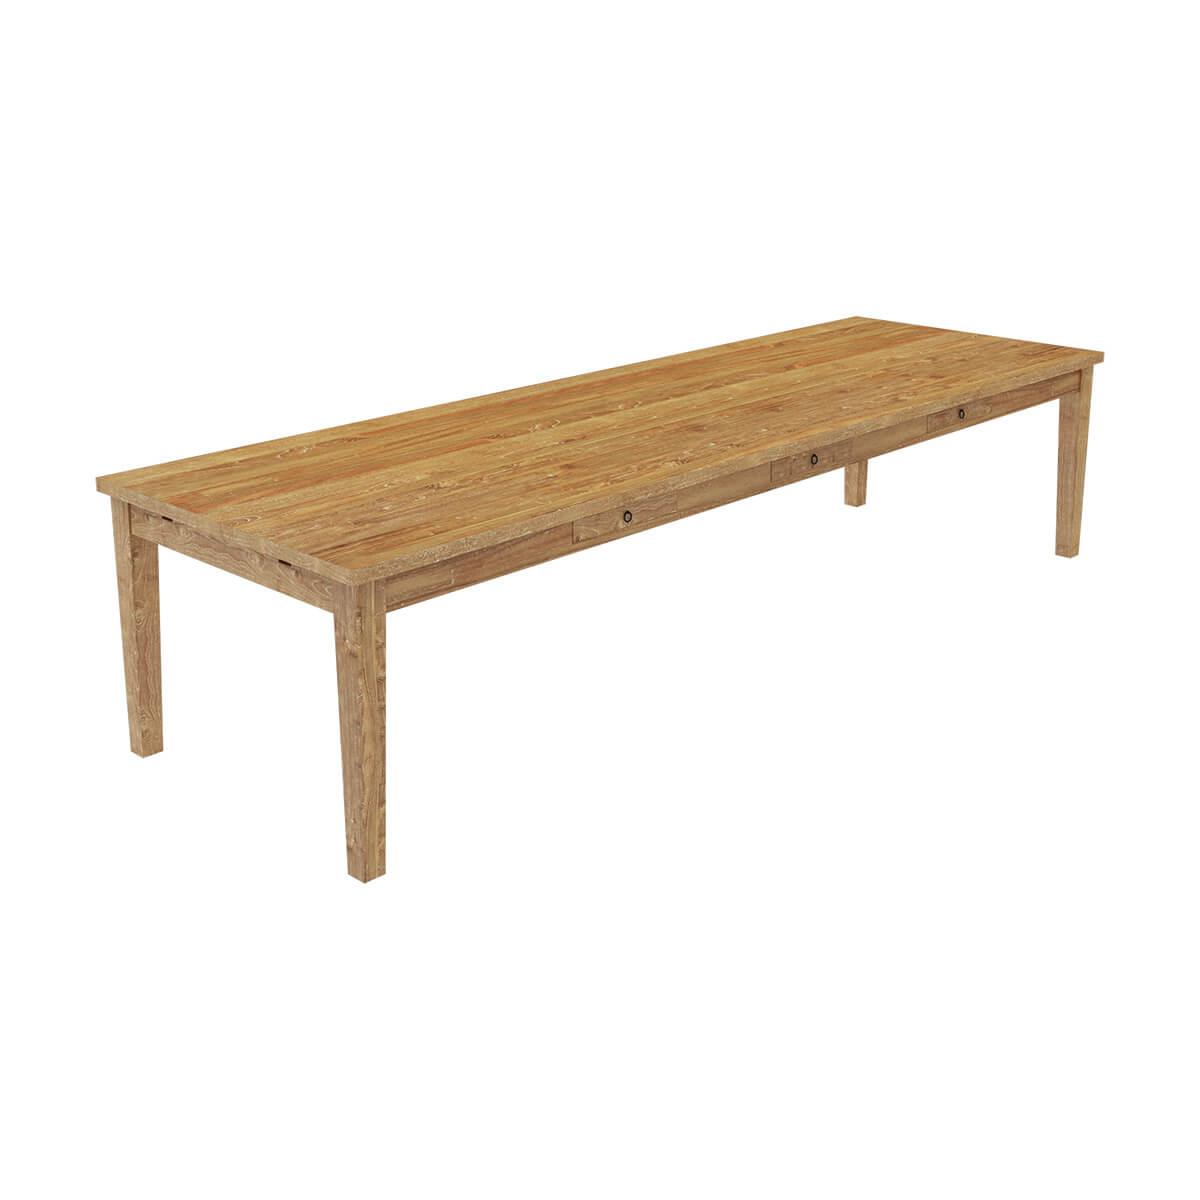 brussels teak wood large extendable dining table for 16 people. Black Bedroom Furniture Sets. Home Design Ideas